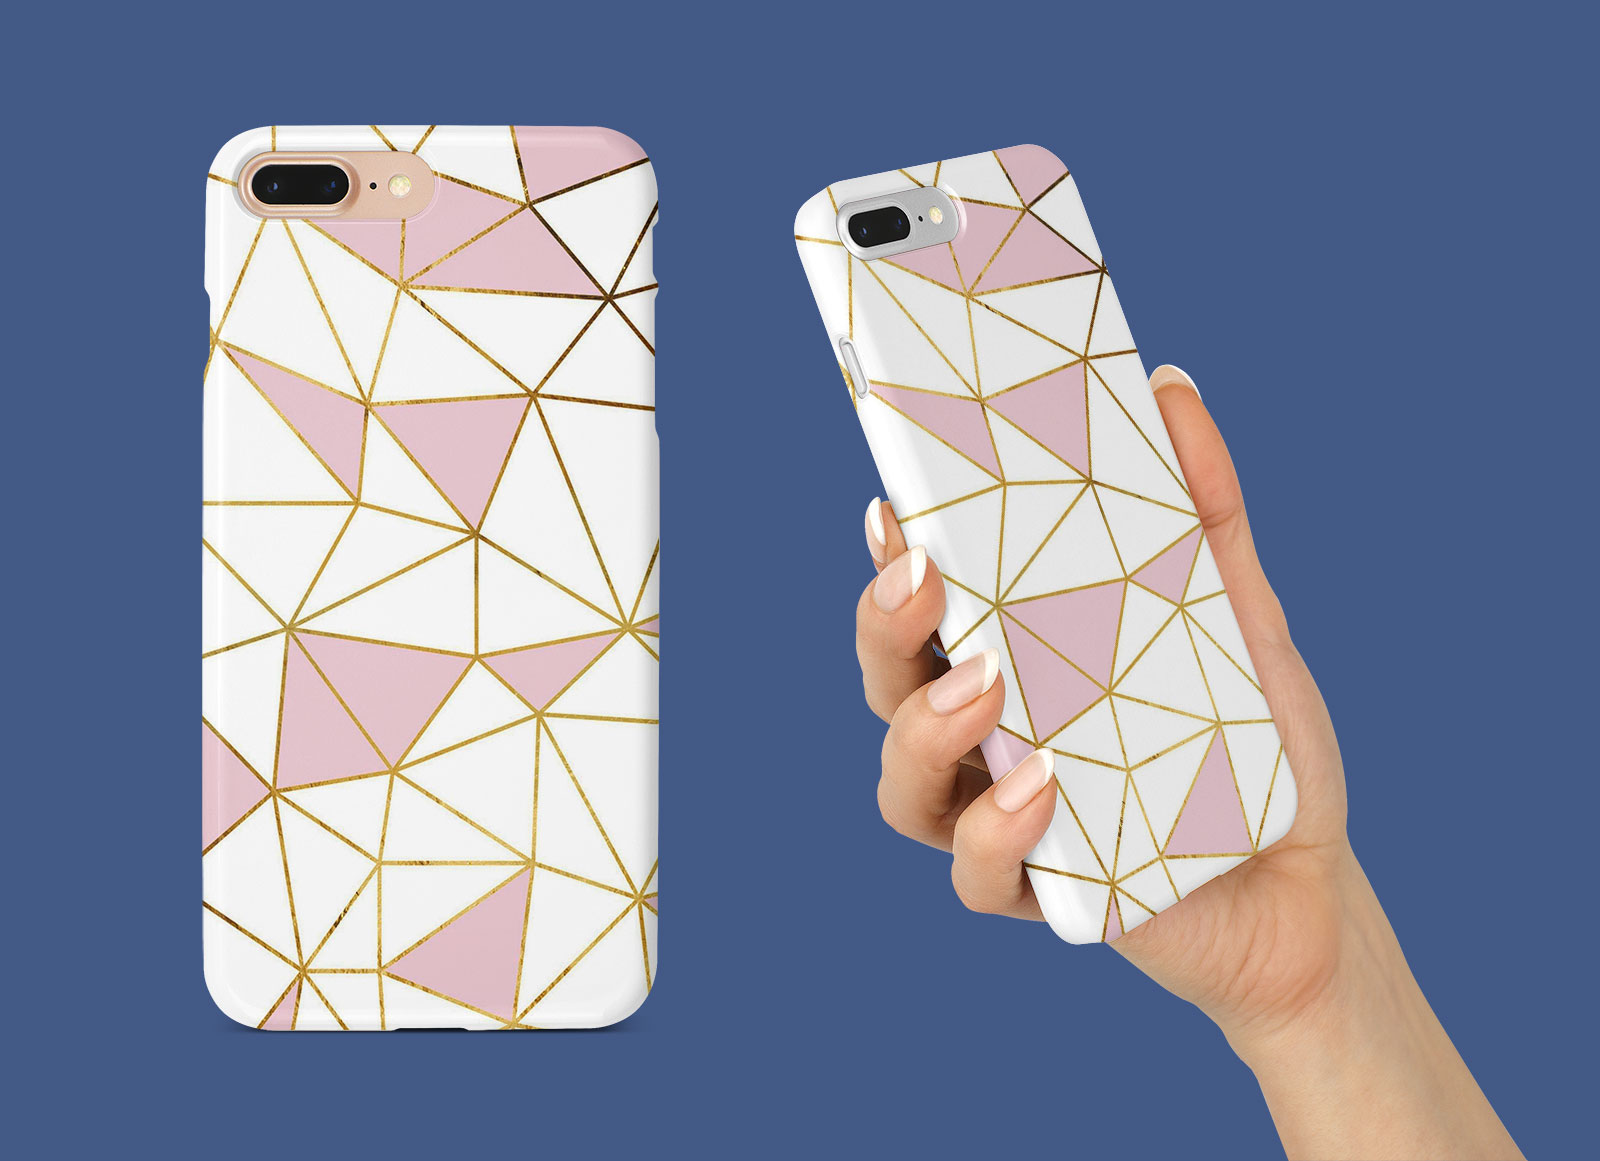 Free-iPhone-8-Plus-Plastic-Case-Mockup-PSD-Set-2